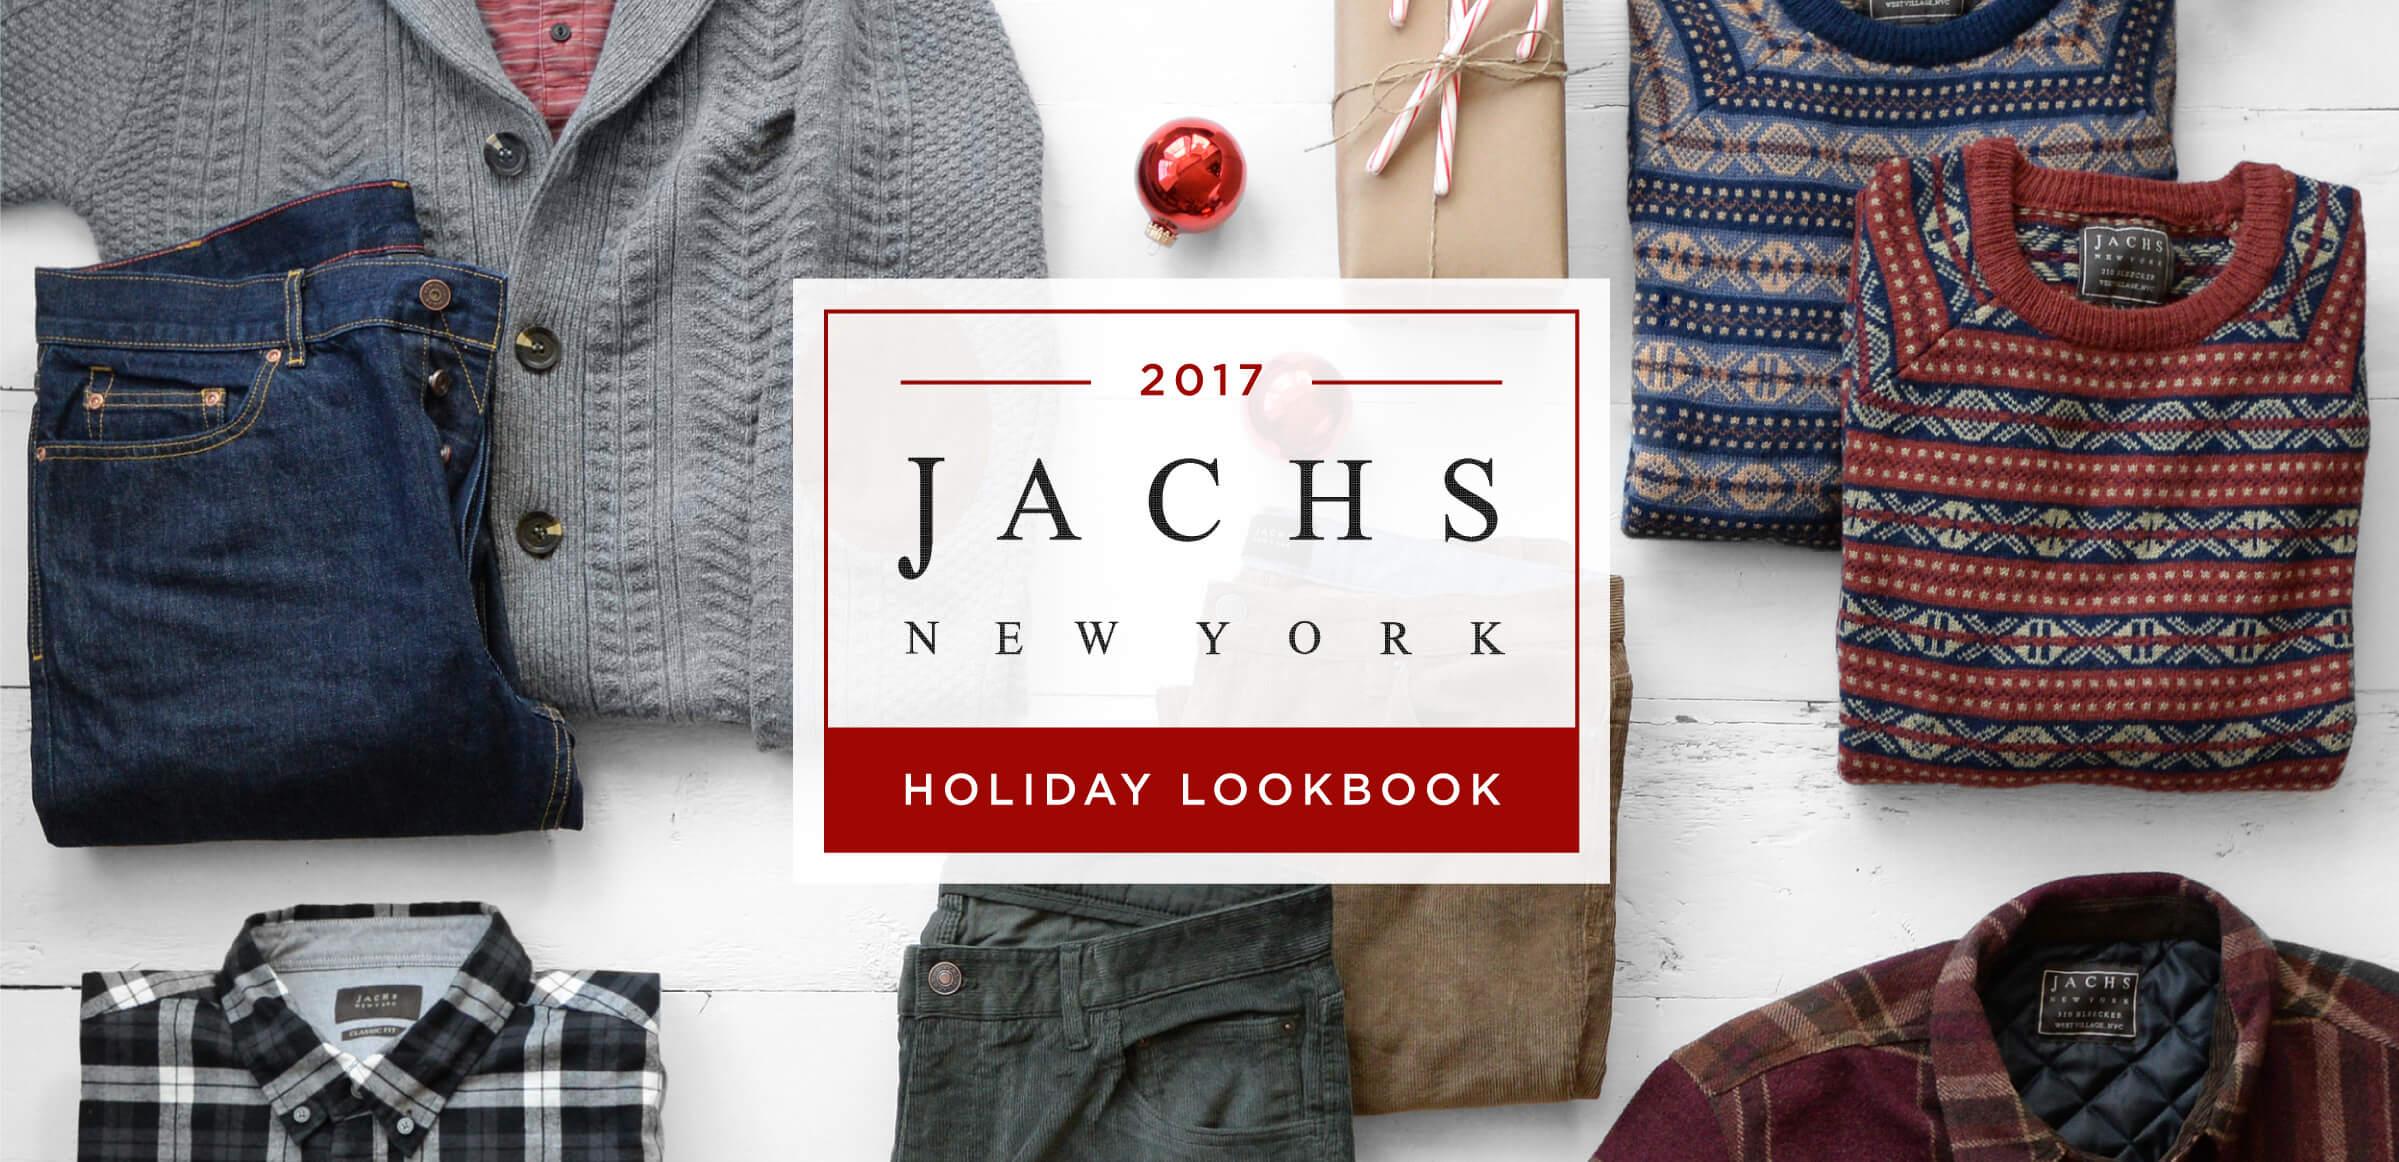 5681425b JachsNY Holiday Lookbook 2017 - MyCreativeLook